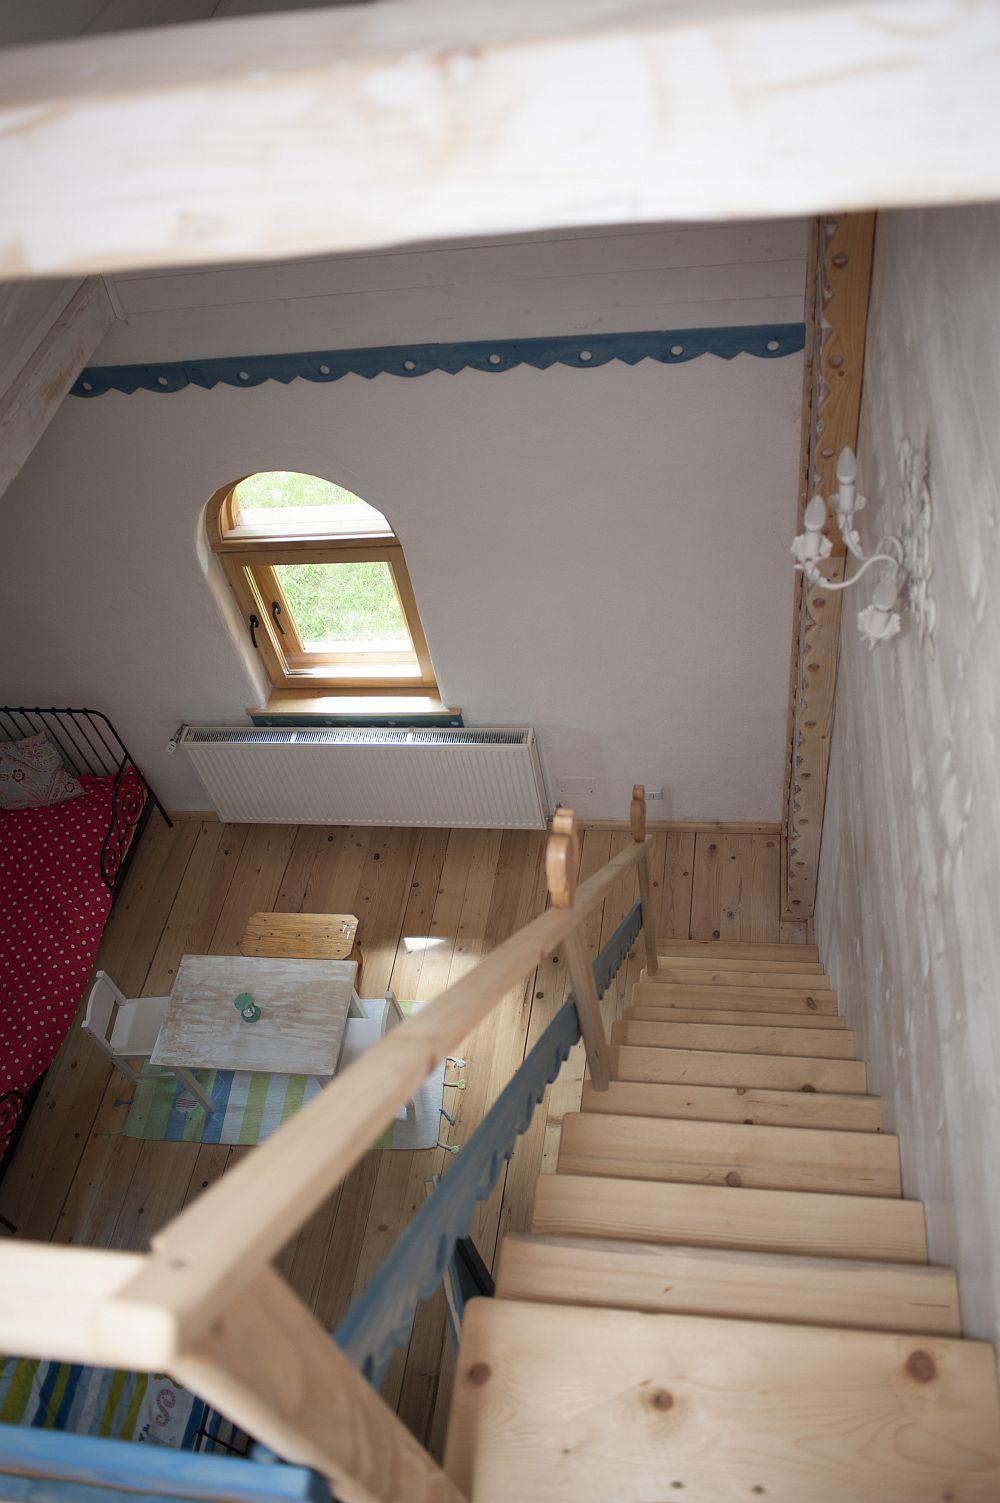 adelaparvu.com despre casa traditionala romaneasca reinterpretata, Foto Dragos Boldea (59)